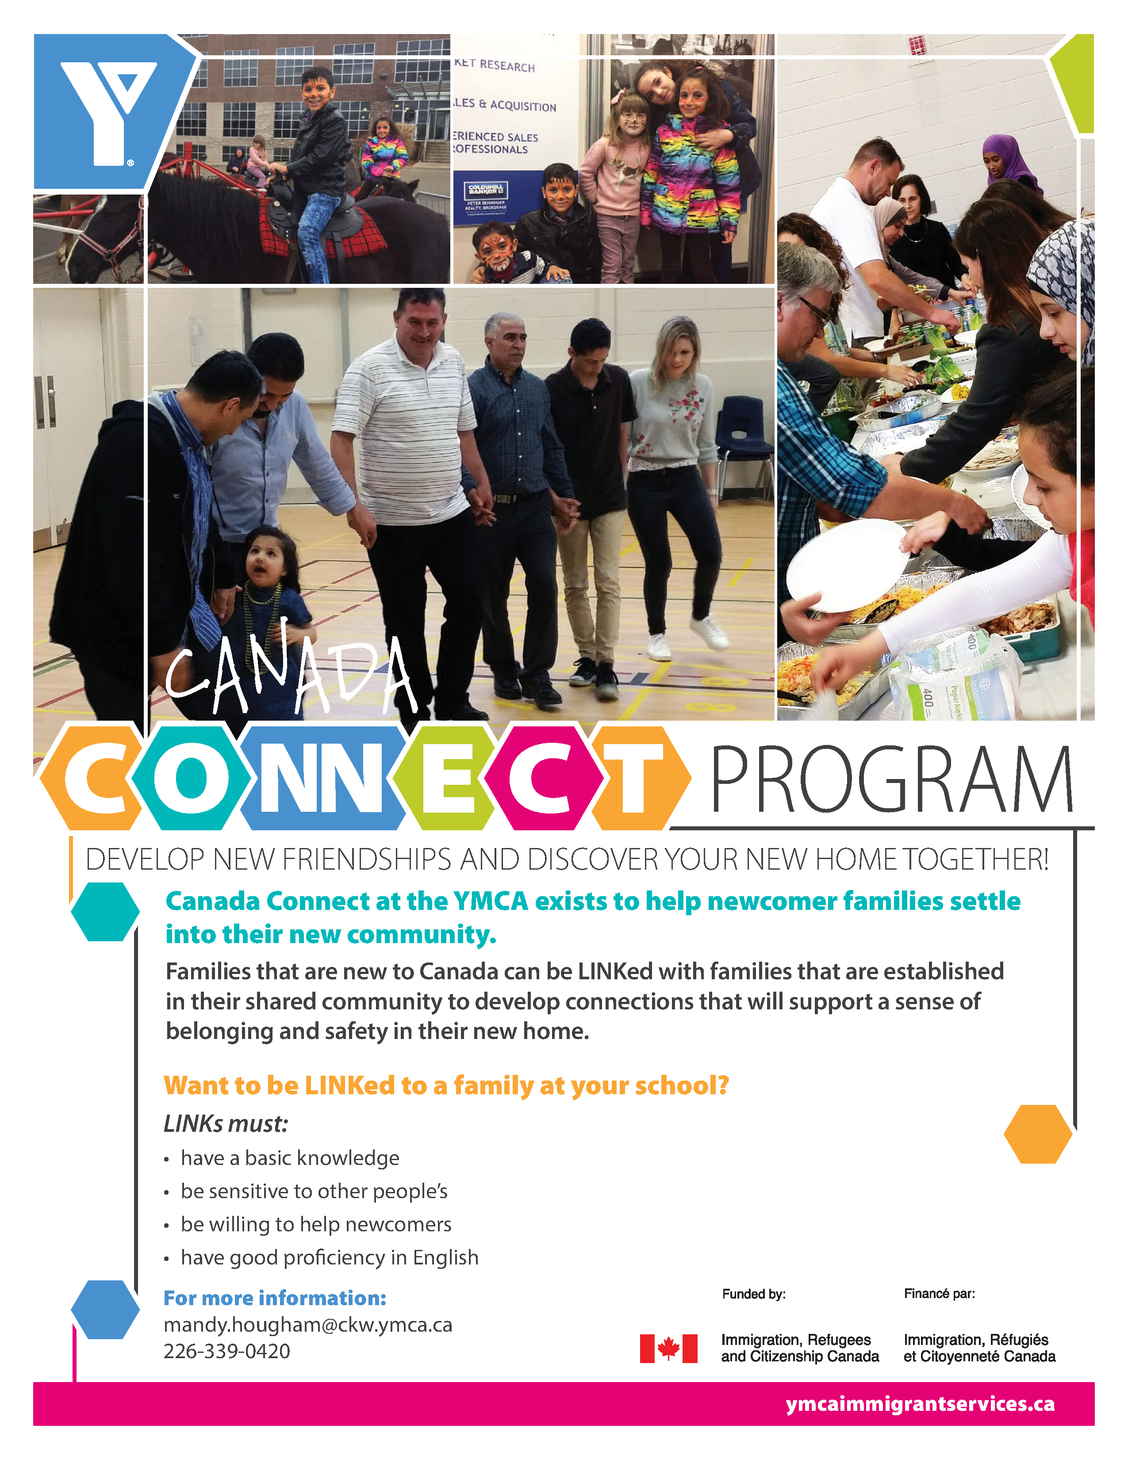 YMCA Connect Program